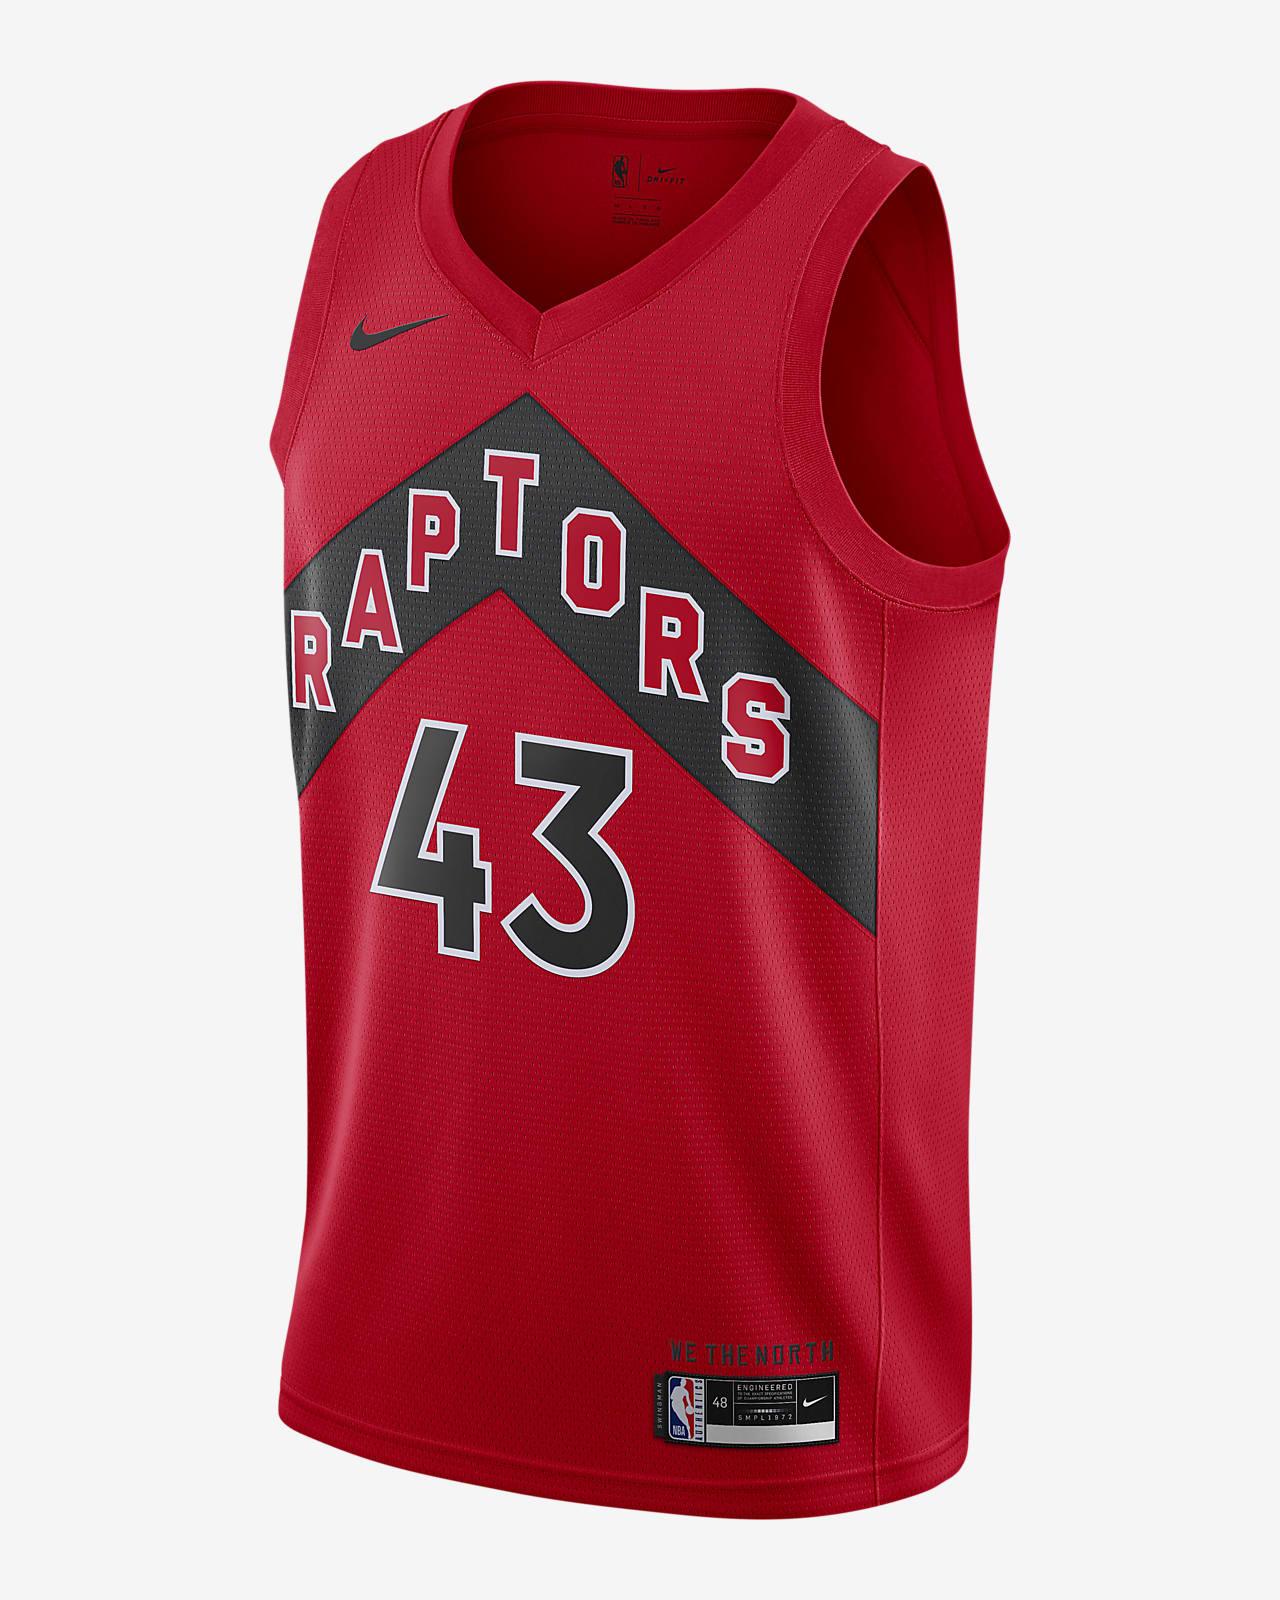 Maillot Nike NBA Swingman Raptors Icon Edition 2020